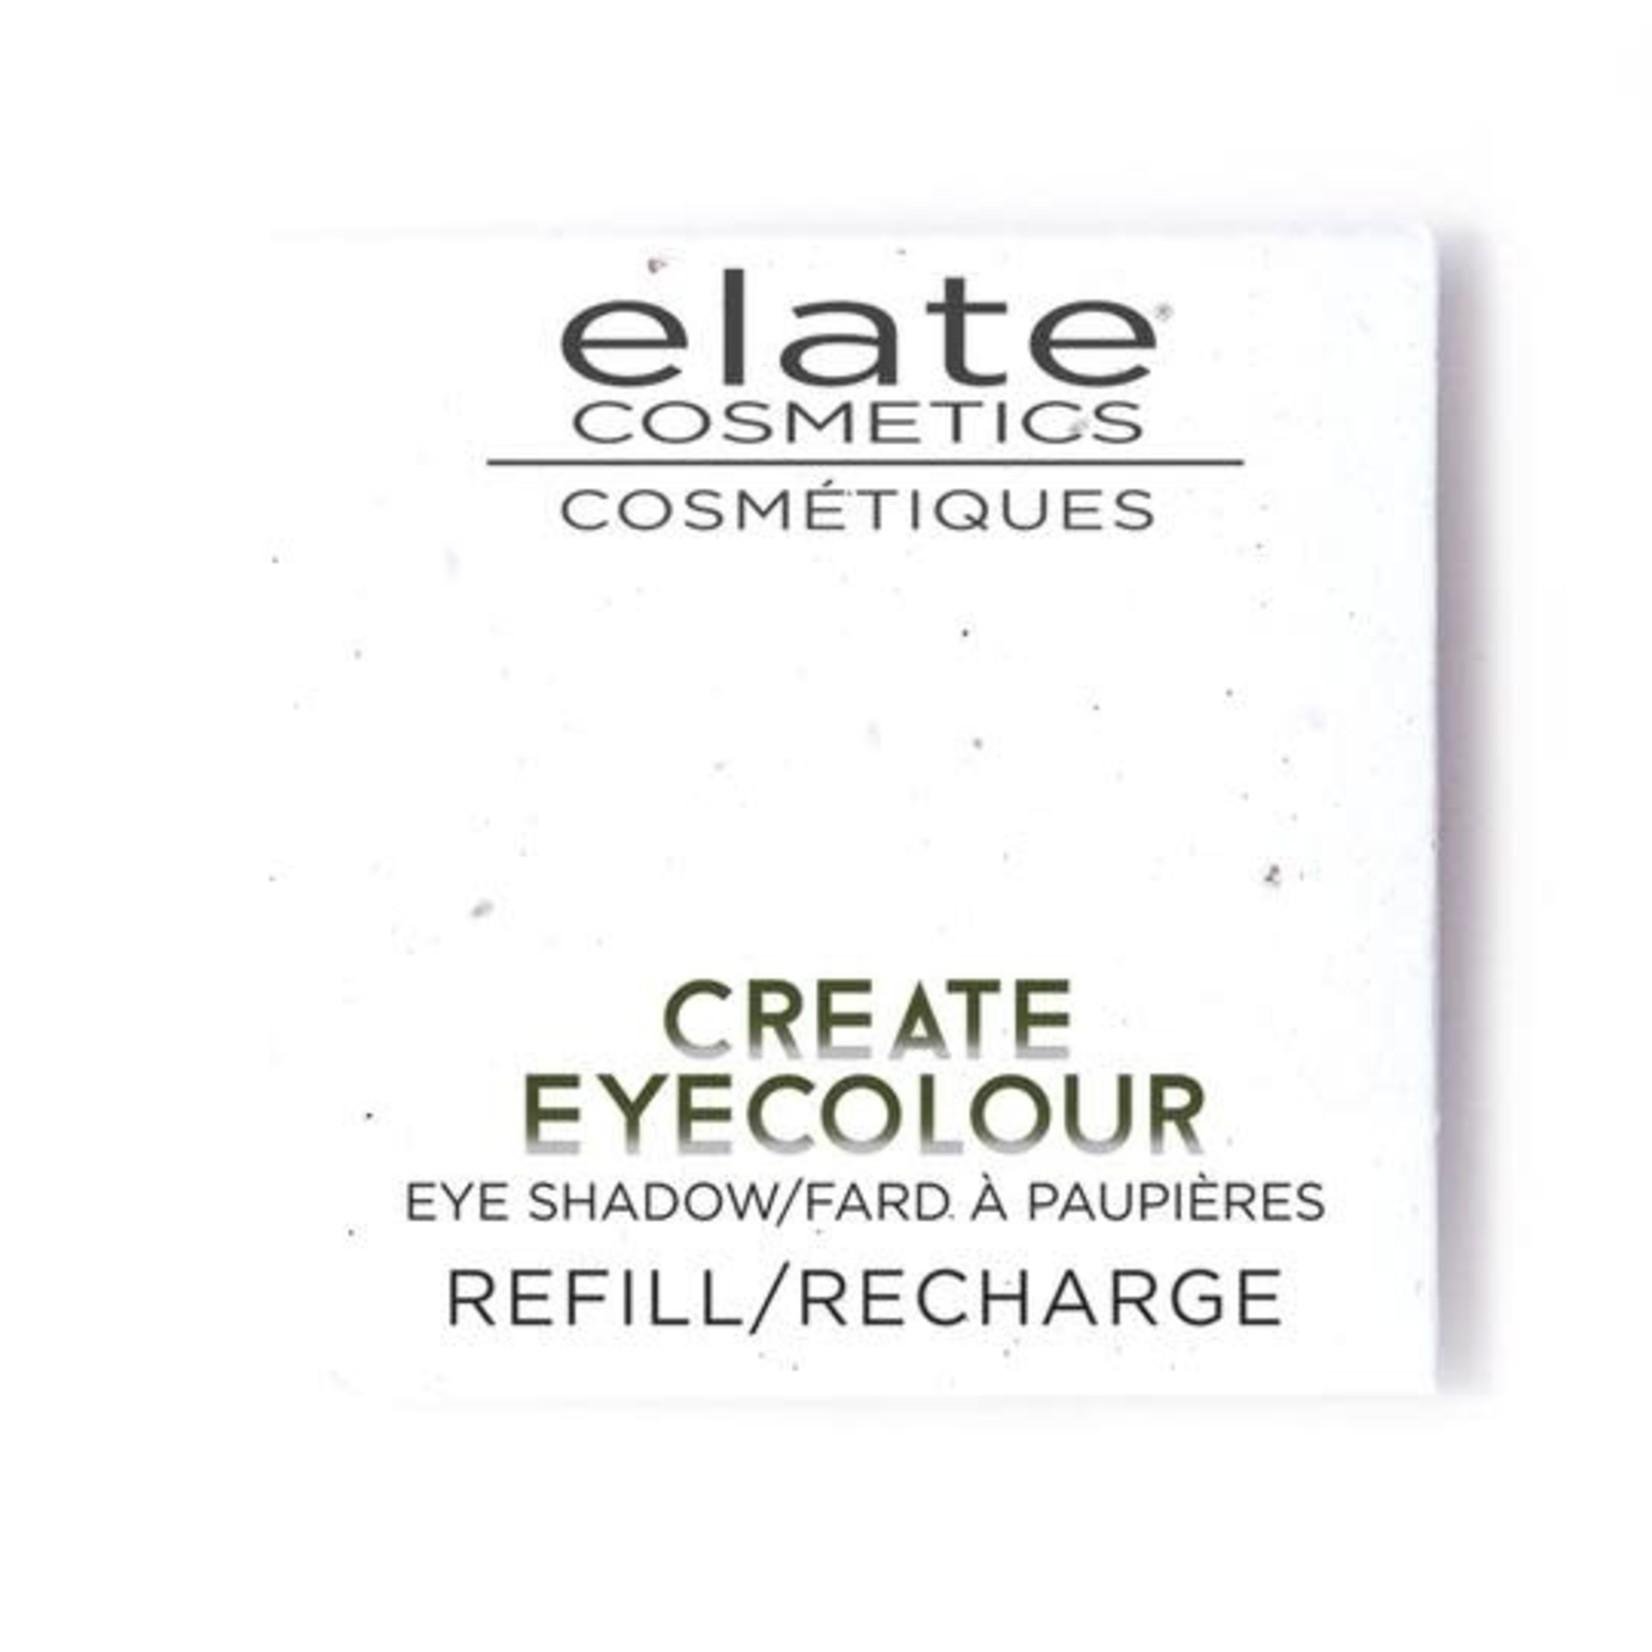 ELATE COSMETICS PRESSED EYECOLOUR - STILLNESS